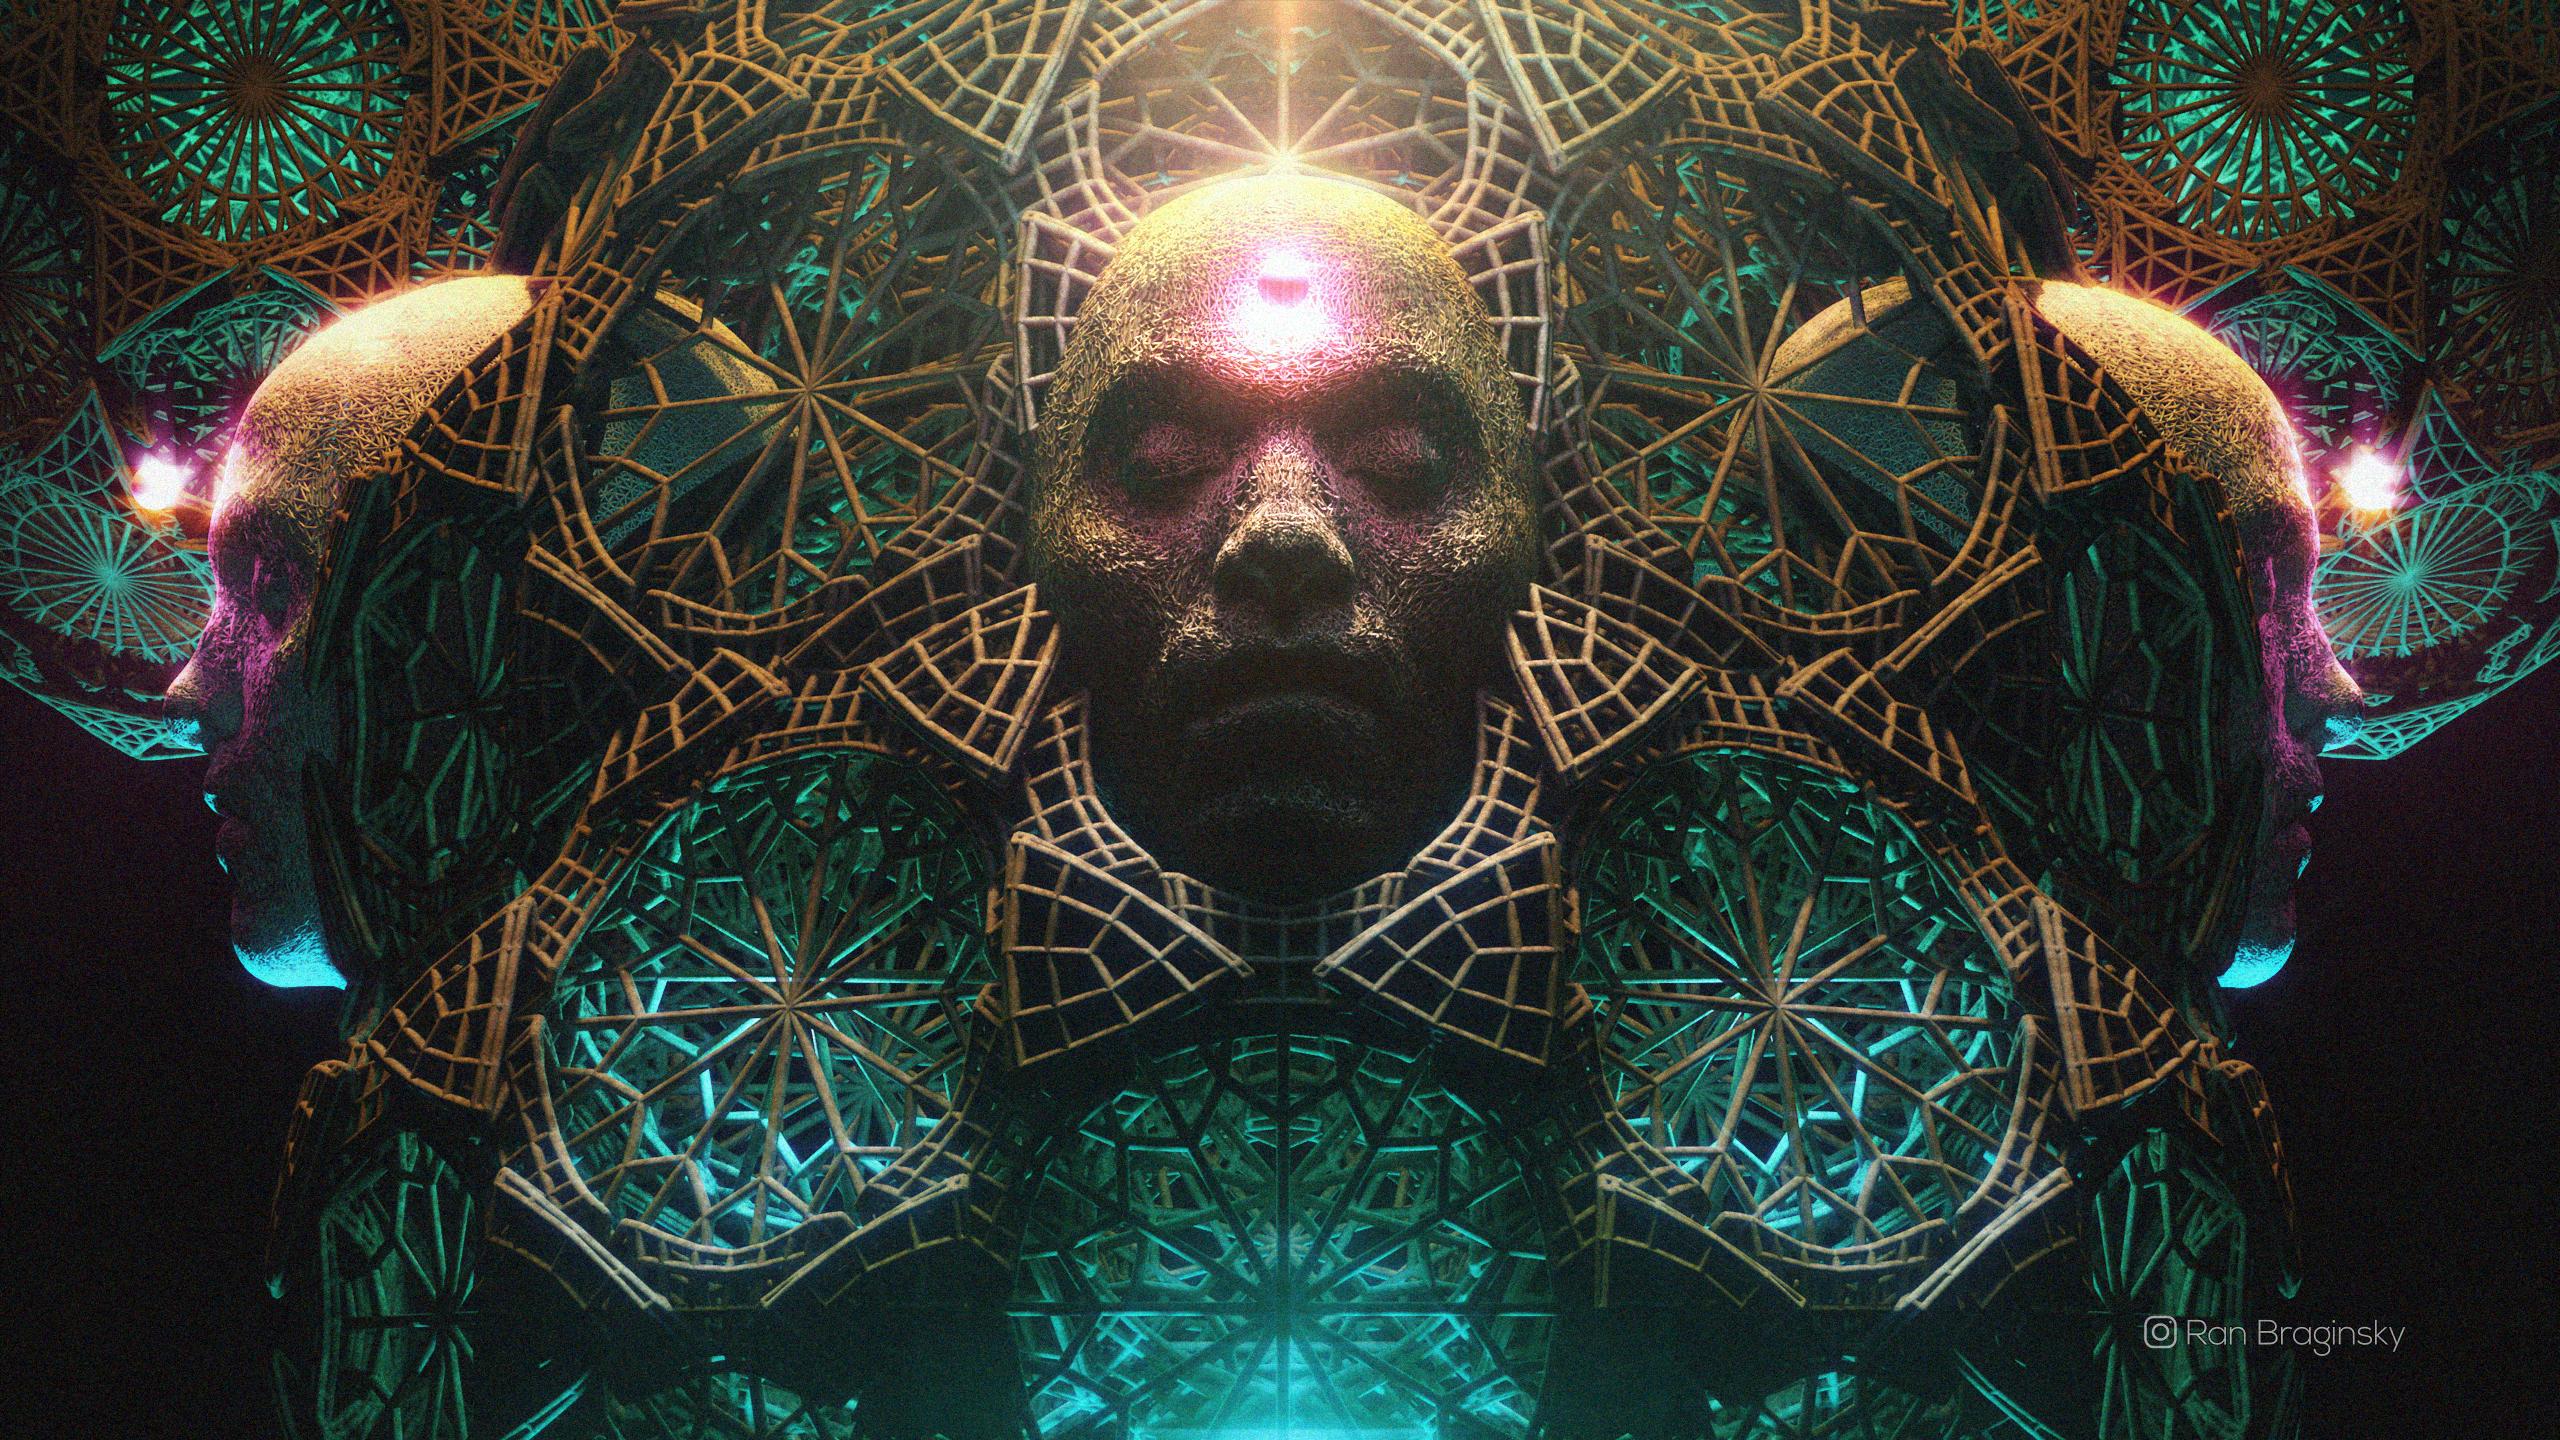 A Tool Inspired Artwork I Created 2560 X 1440